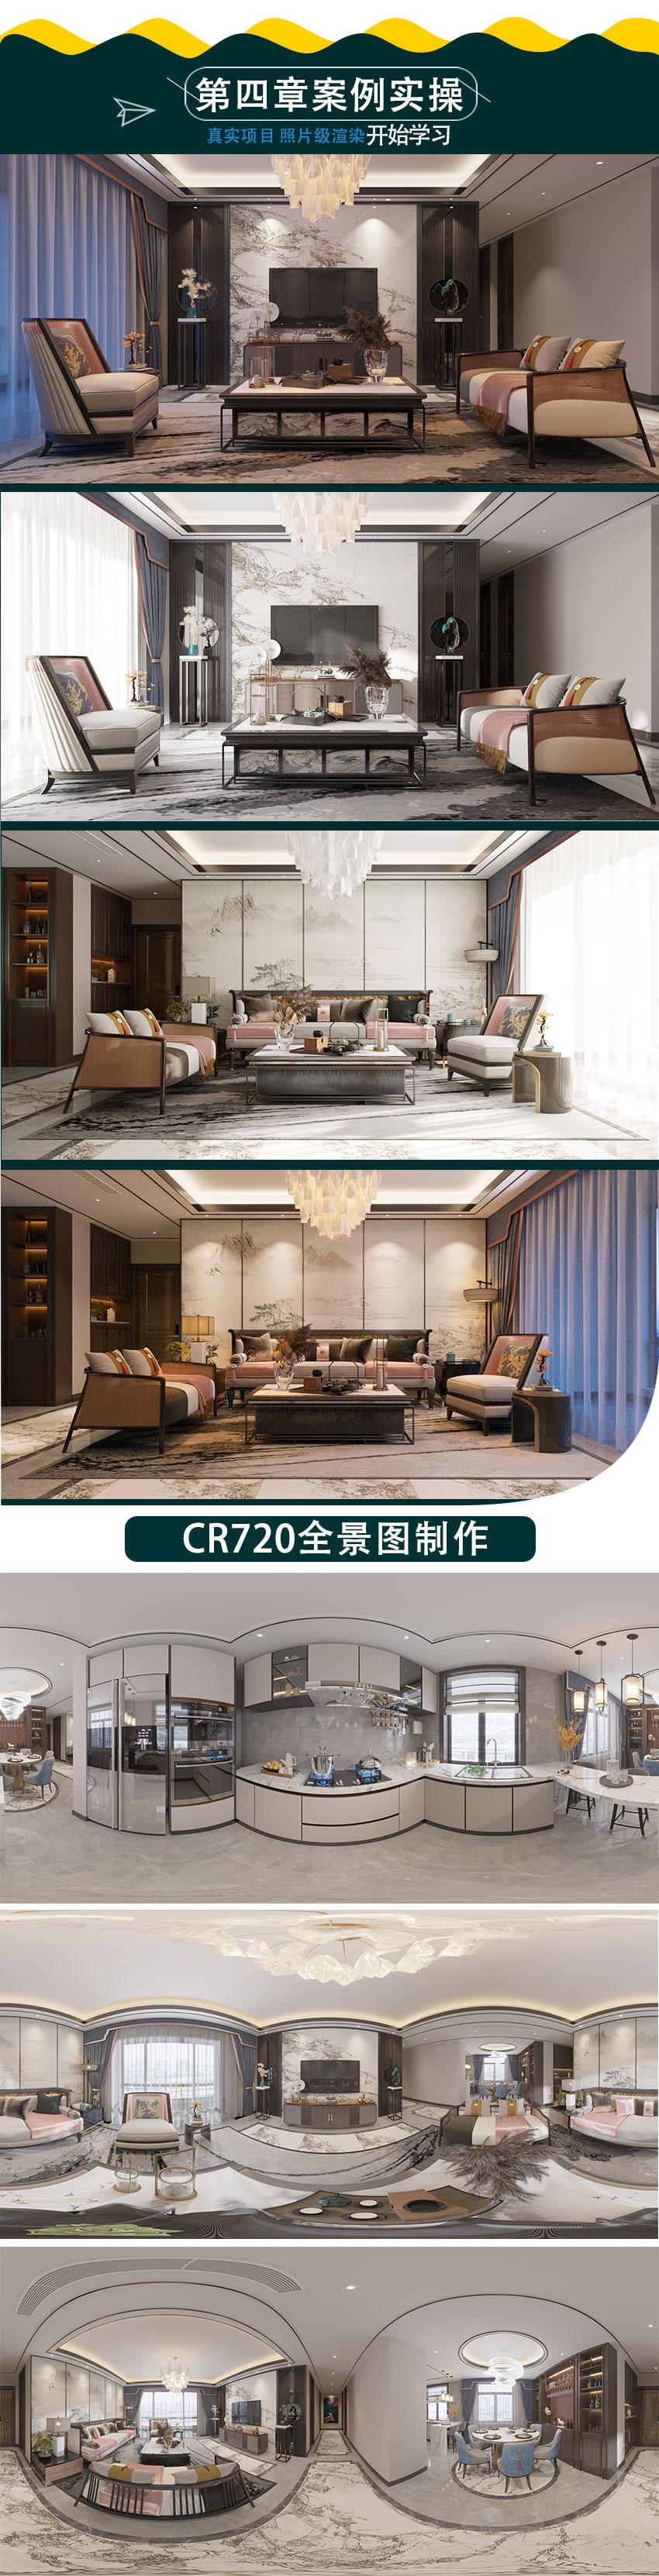 Corona5.0(CR)室内室外效果图渲染教程